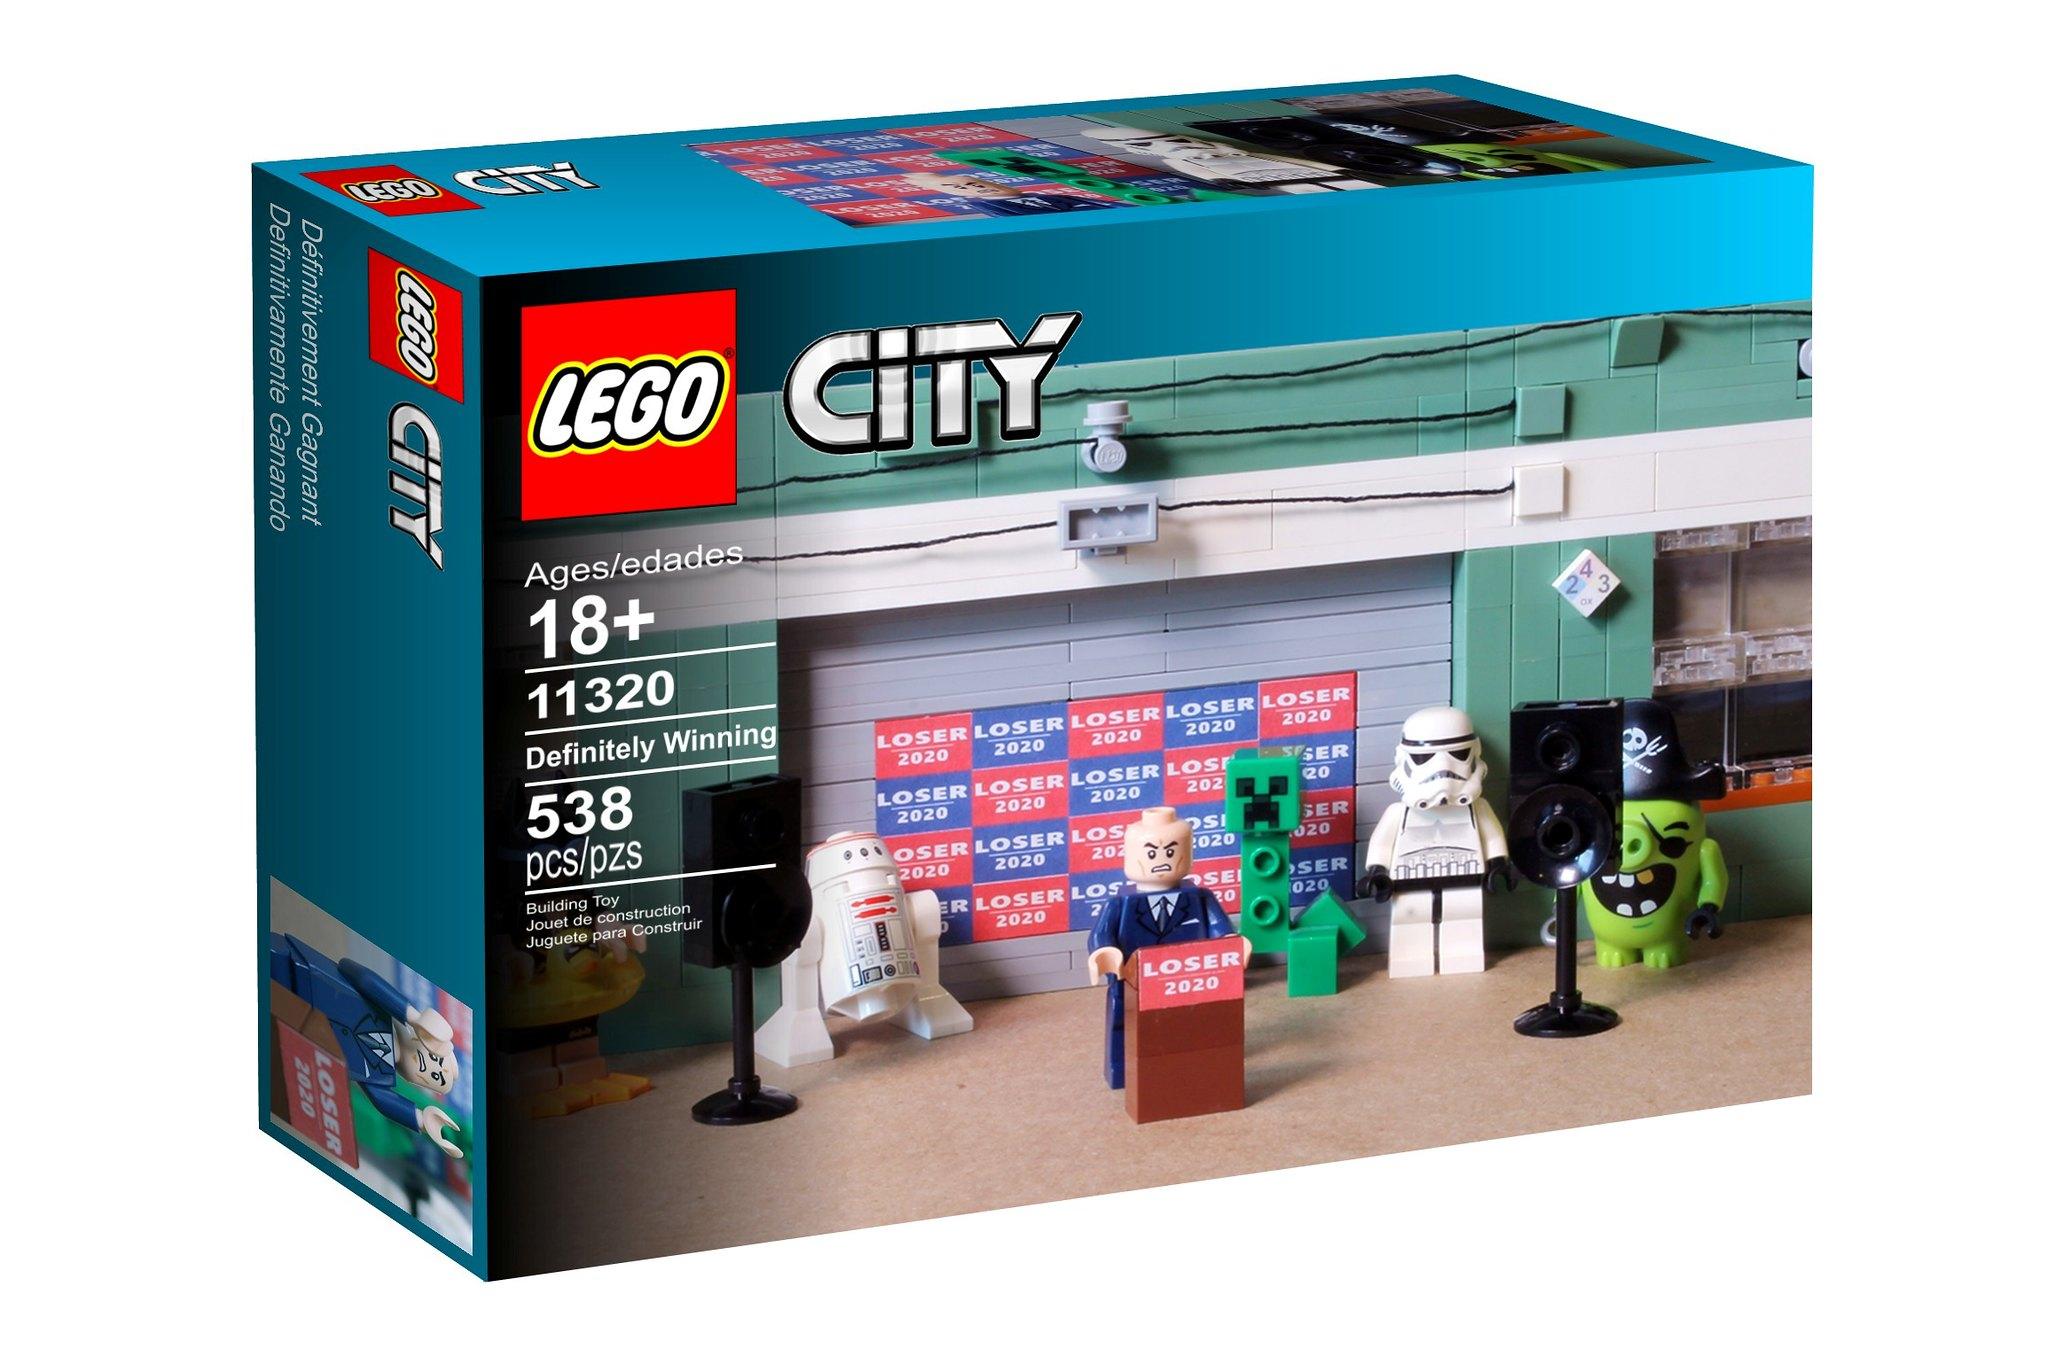 LEGO2.jpg?fit=1&resize=620,4000&ssl=1